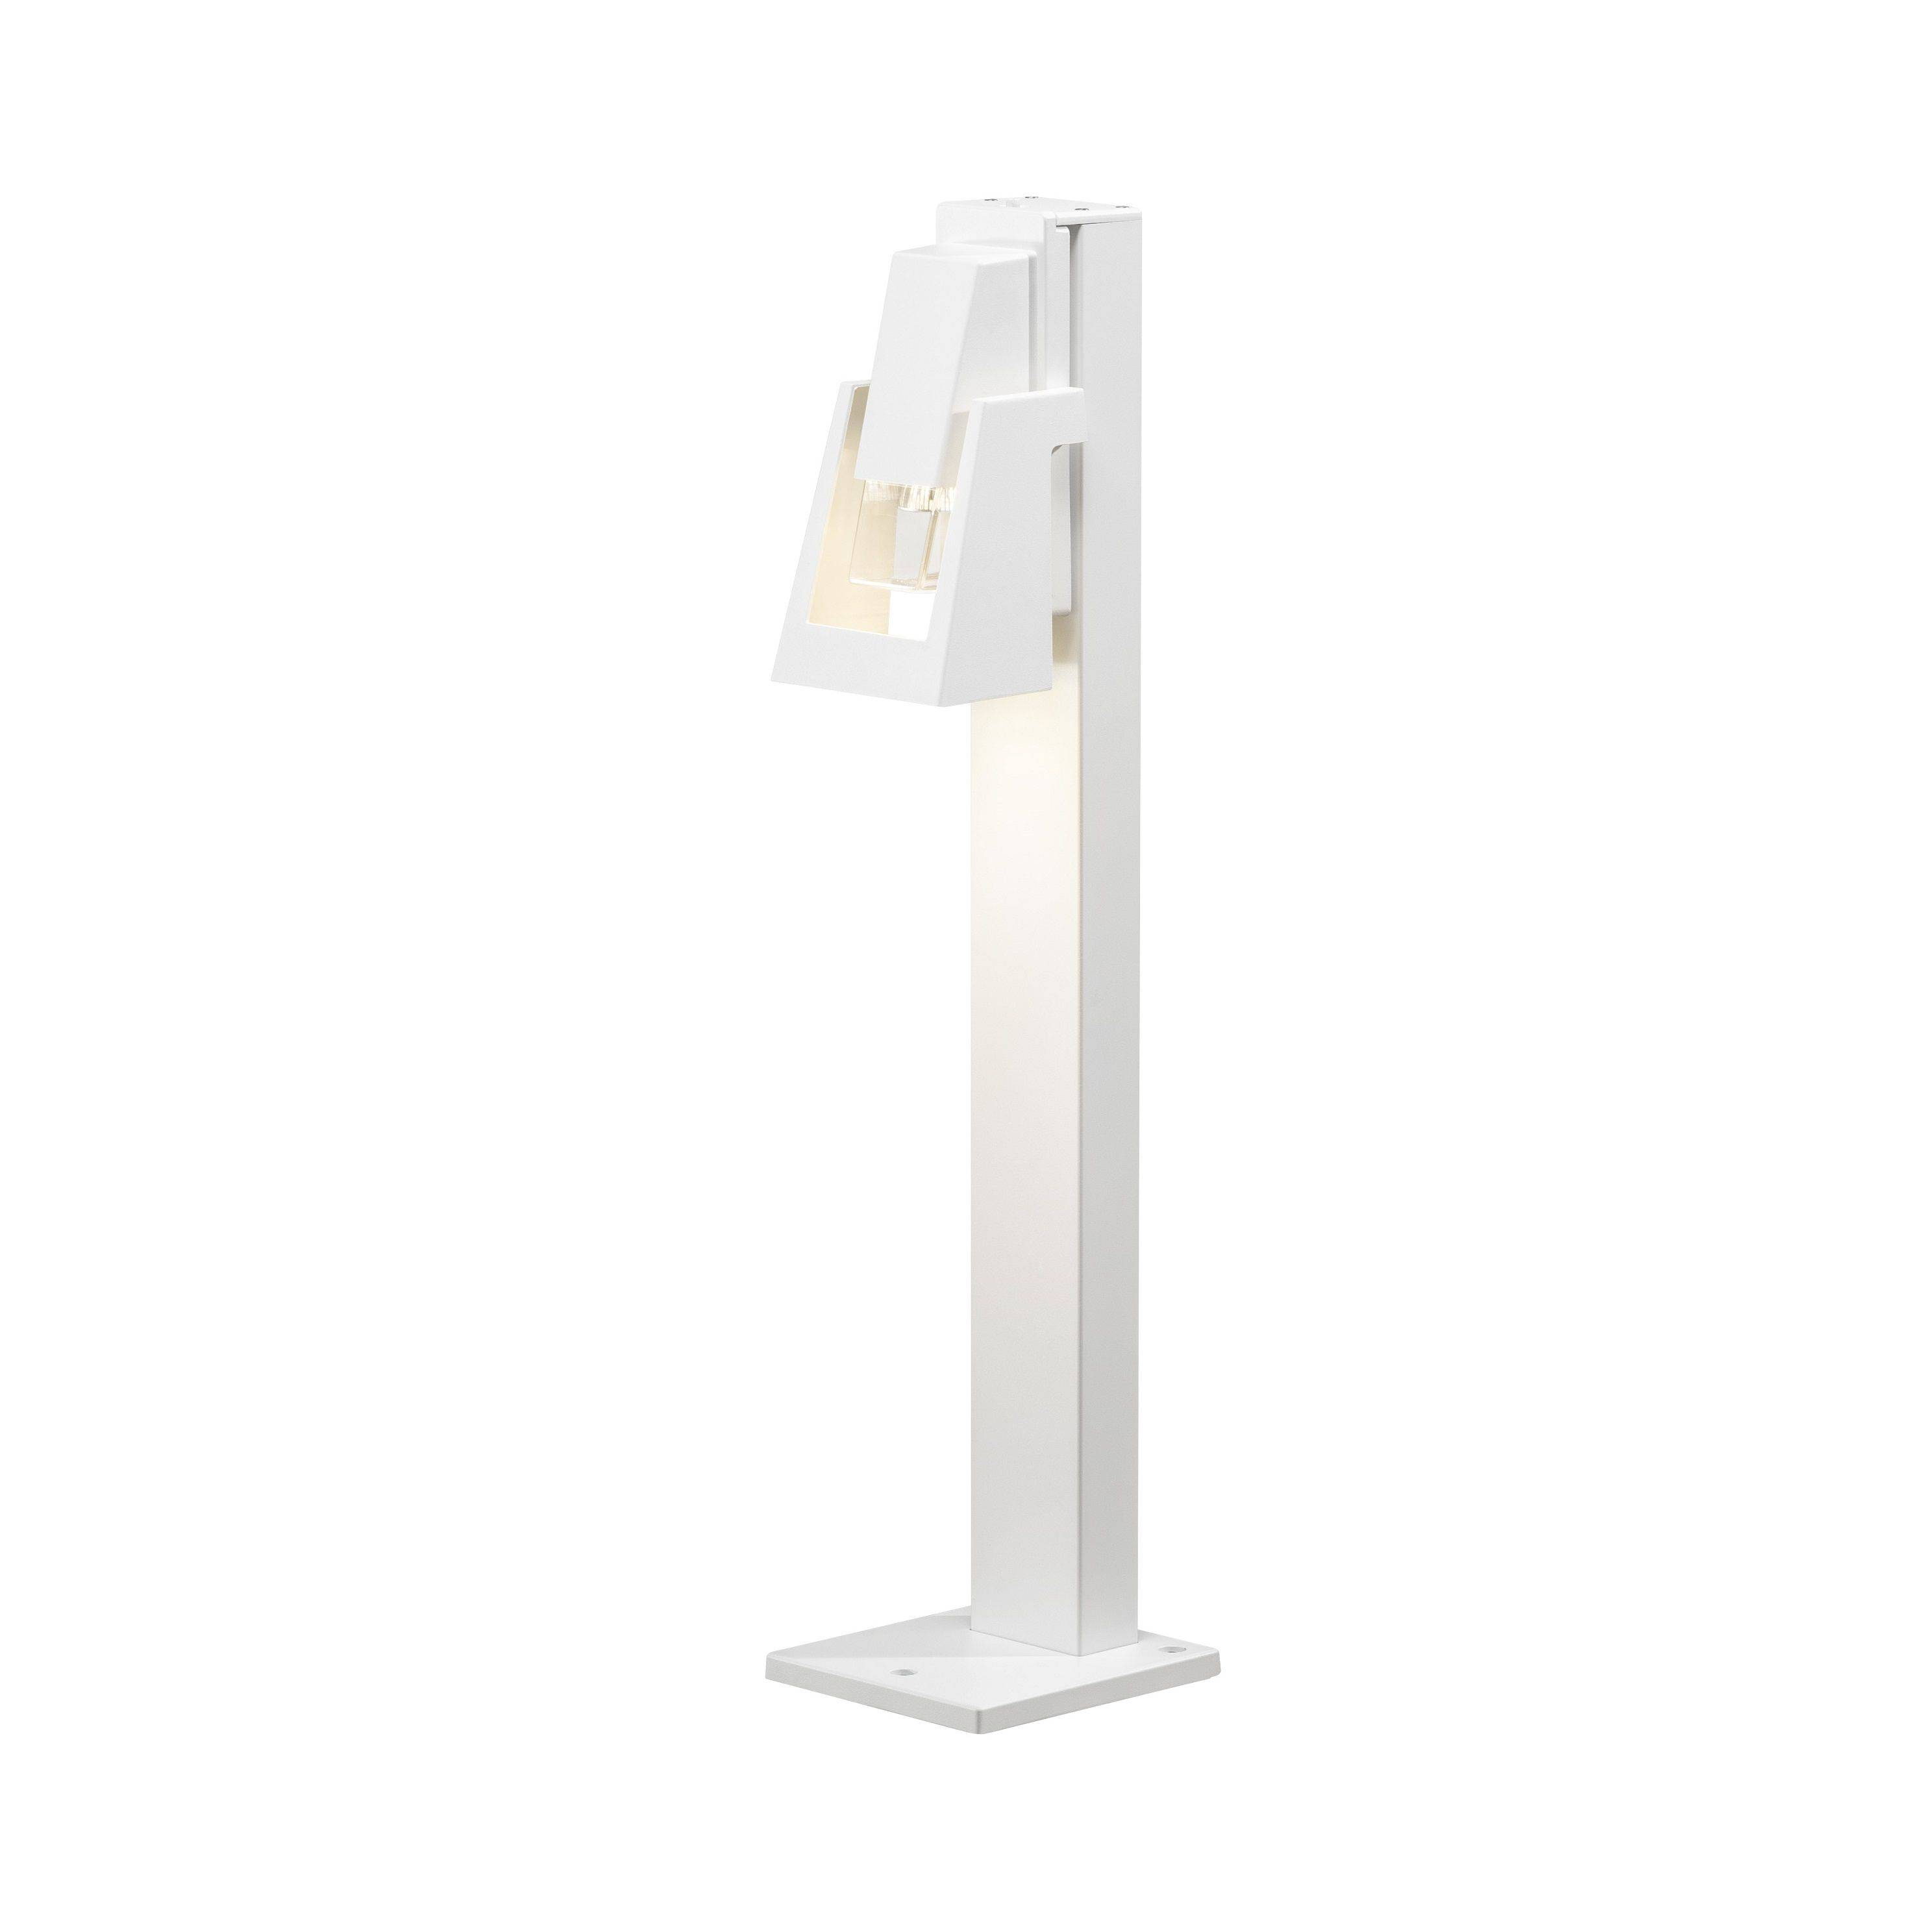 KONSTSMIDE Potenza GU10 inkl stolpe 100cm hvit